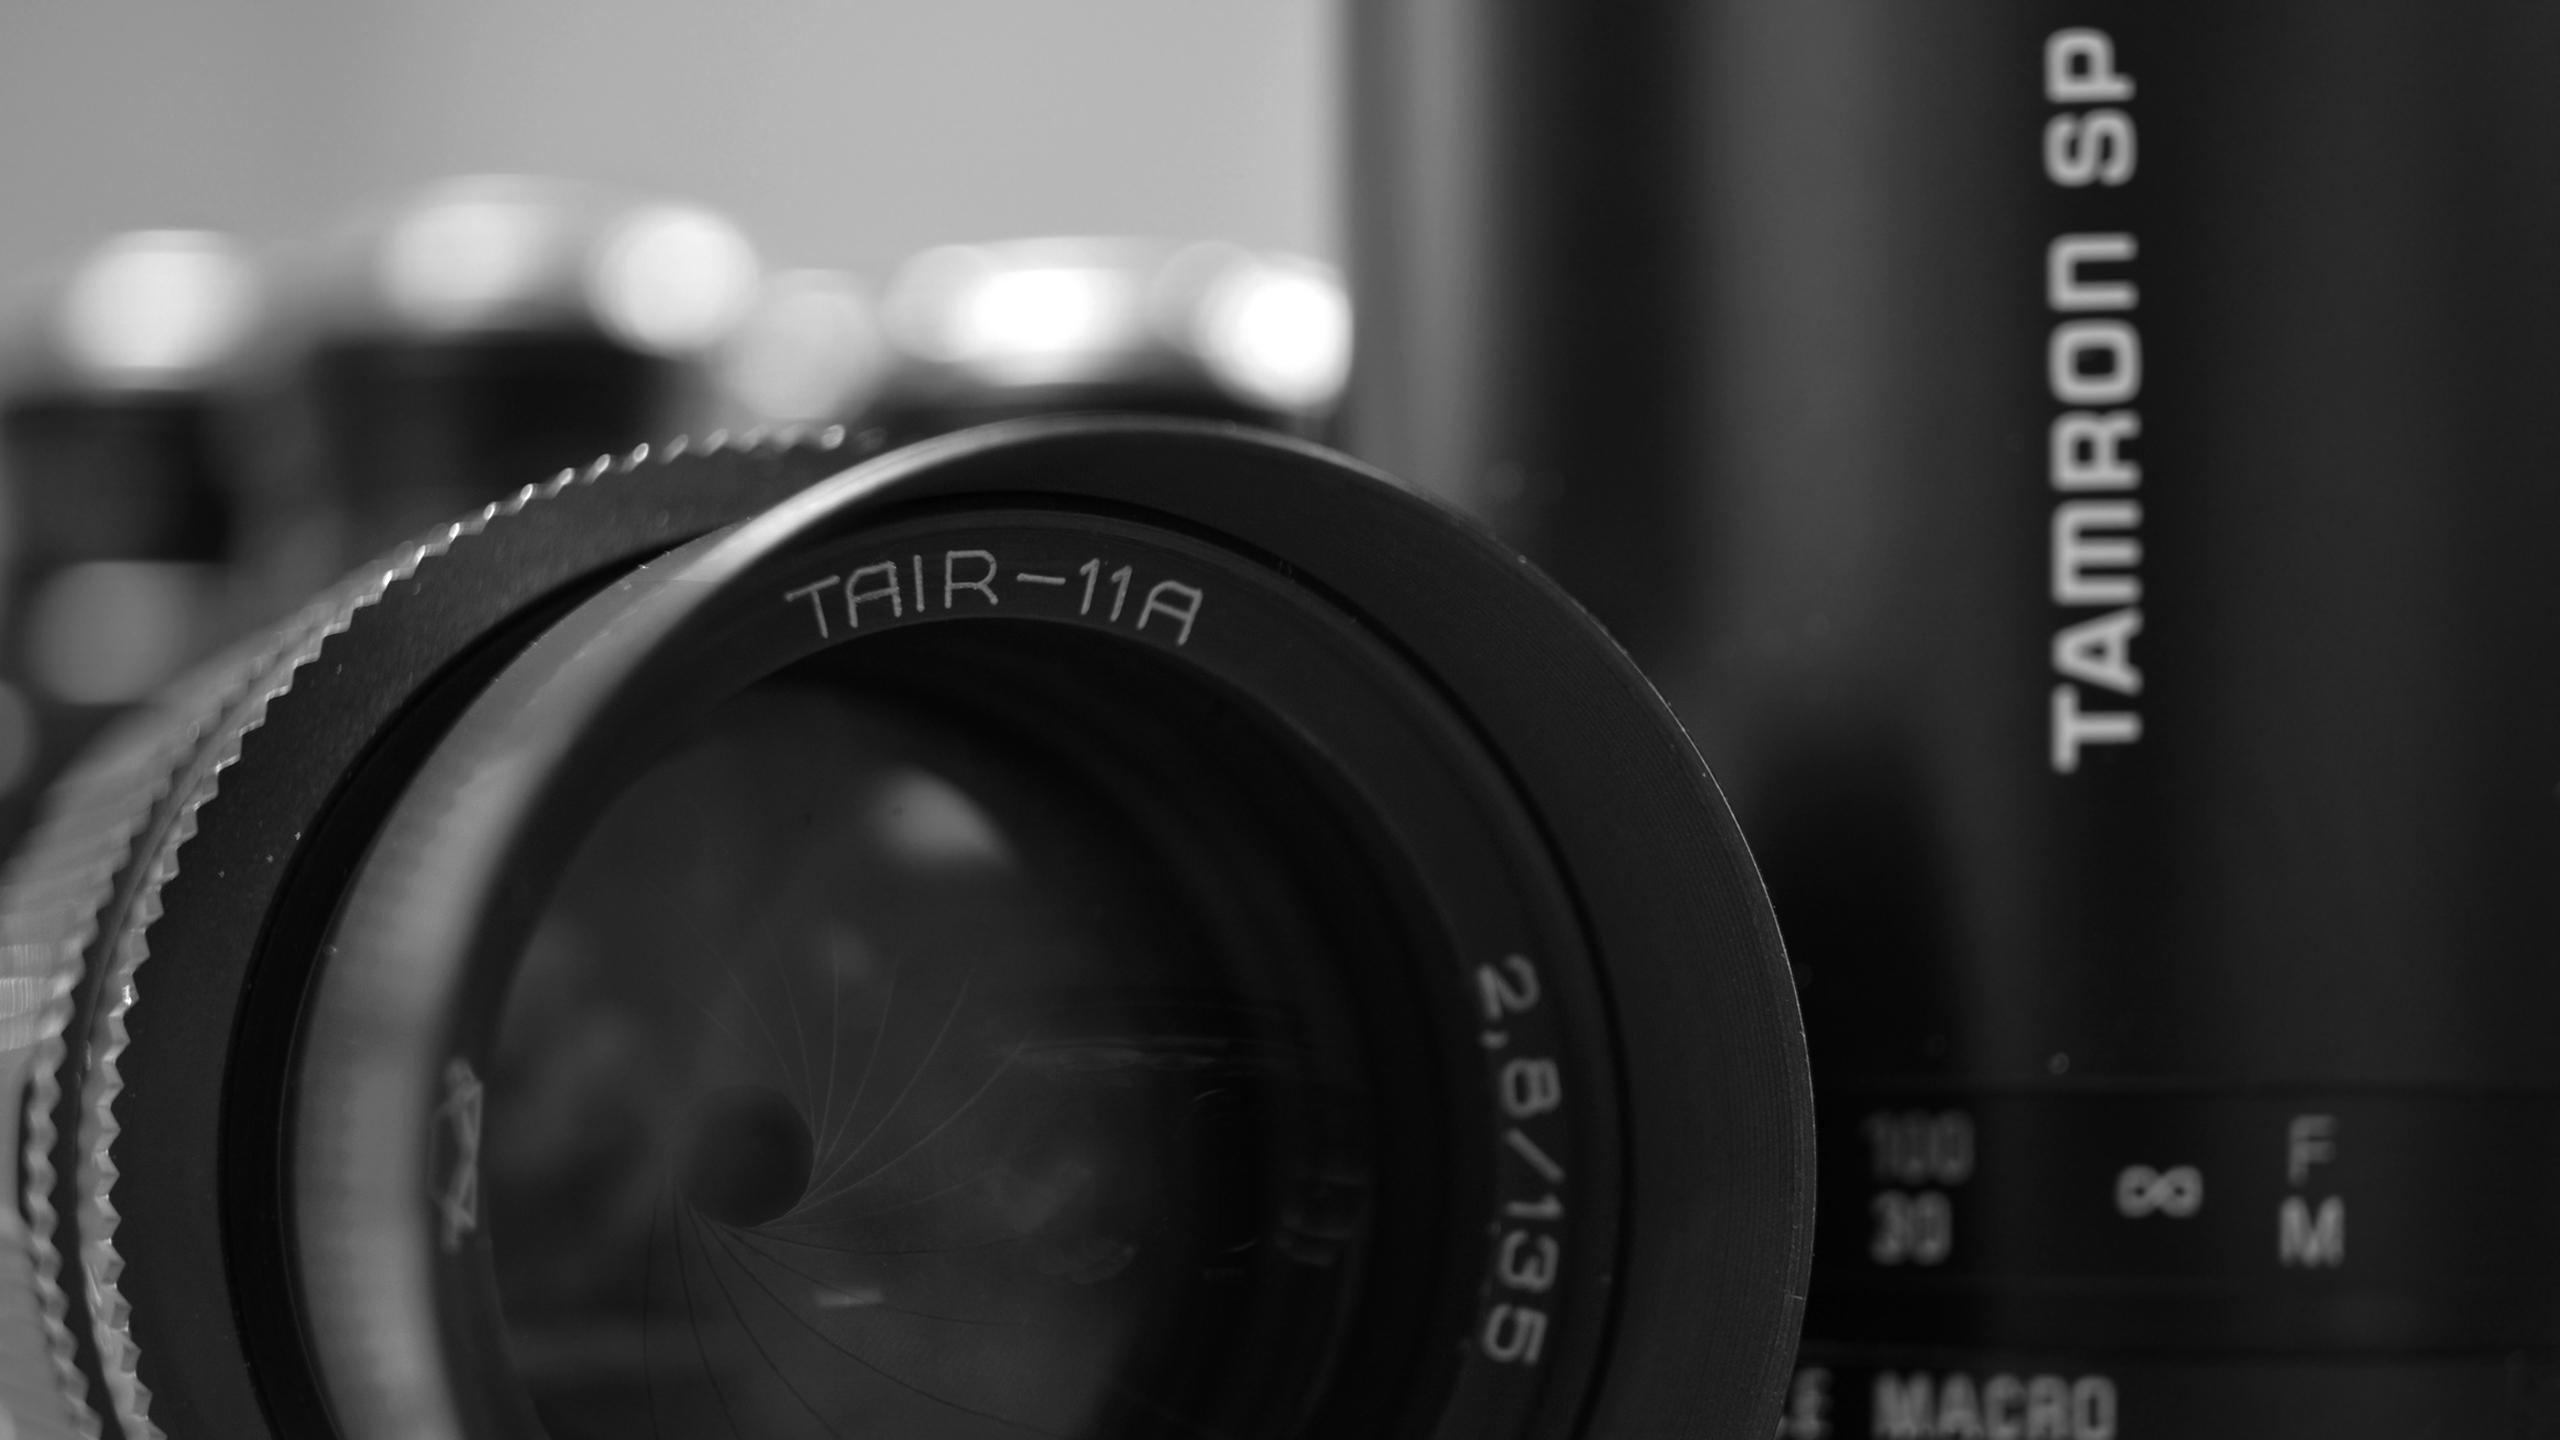 wallpaper hoods photographer metal nikon blades aperture rh wallhere com Nikon D5300 Nikon D5200 DSLR Cameras